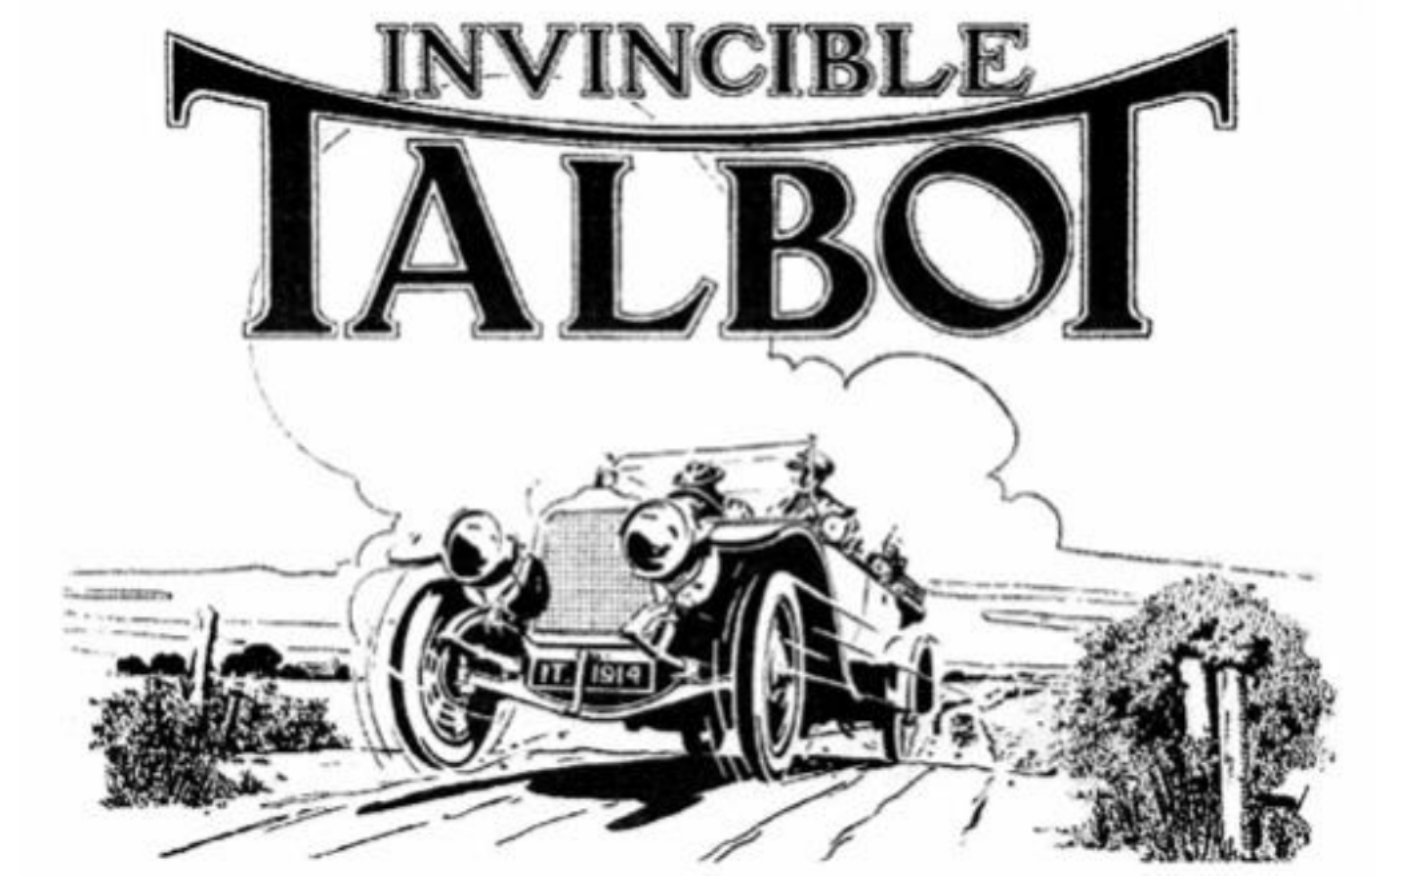 1914 Talbot 4CBX Roadster